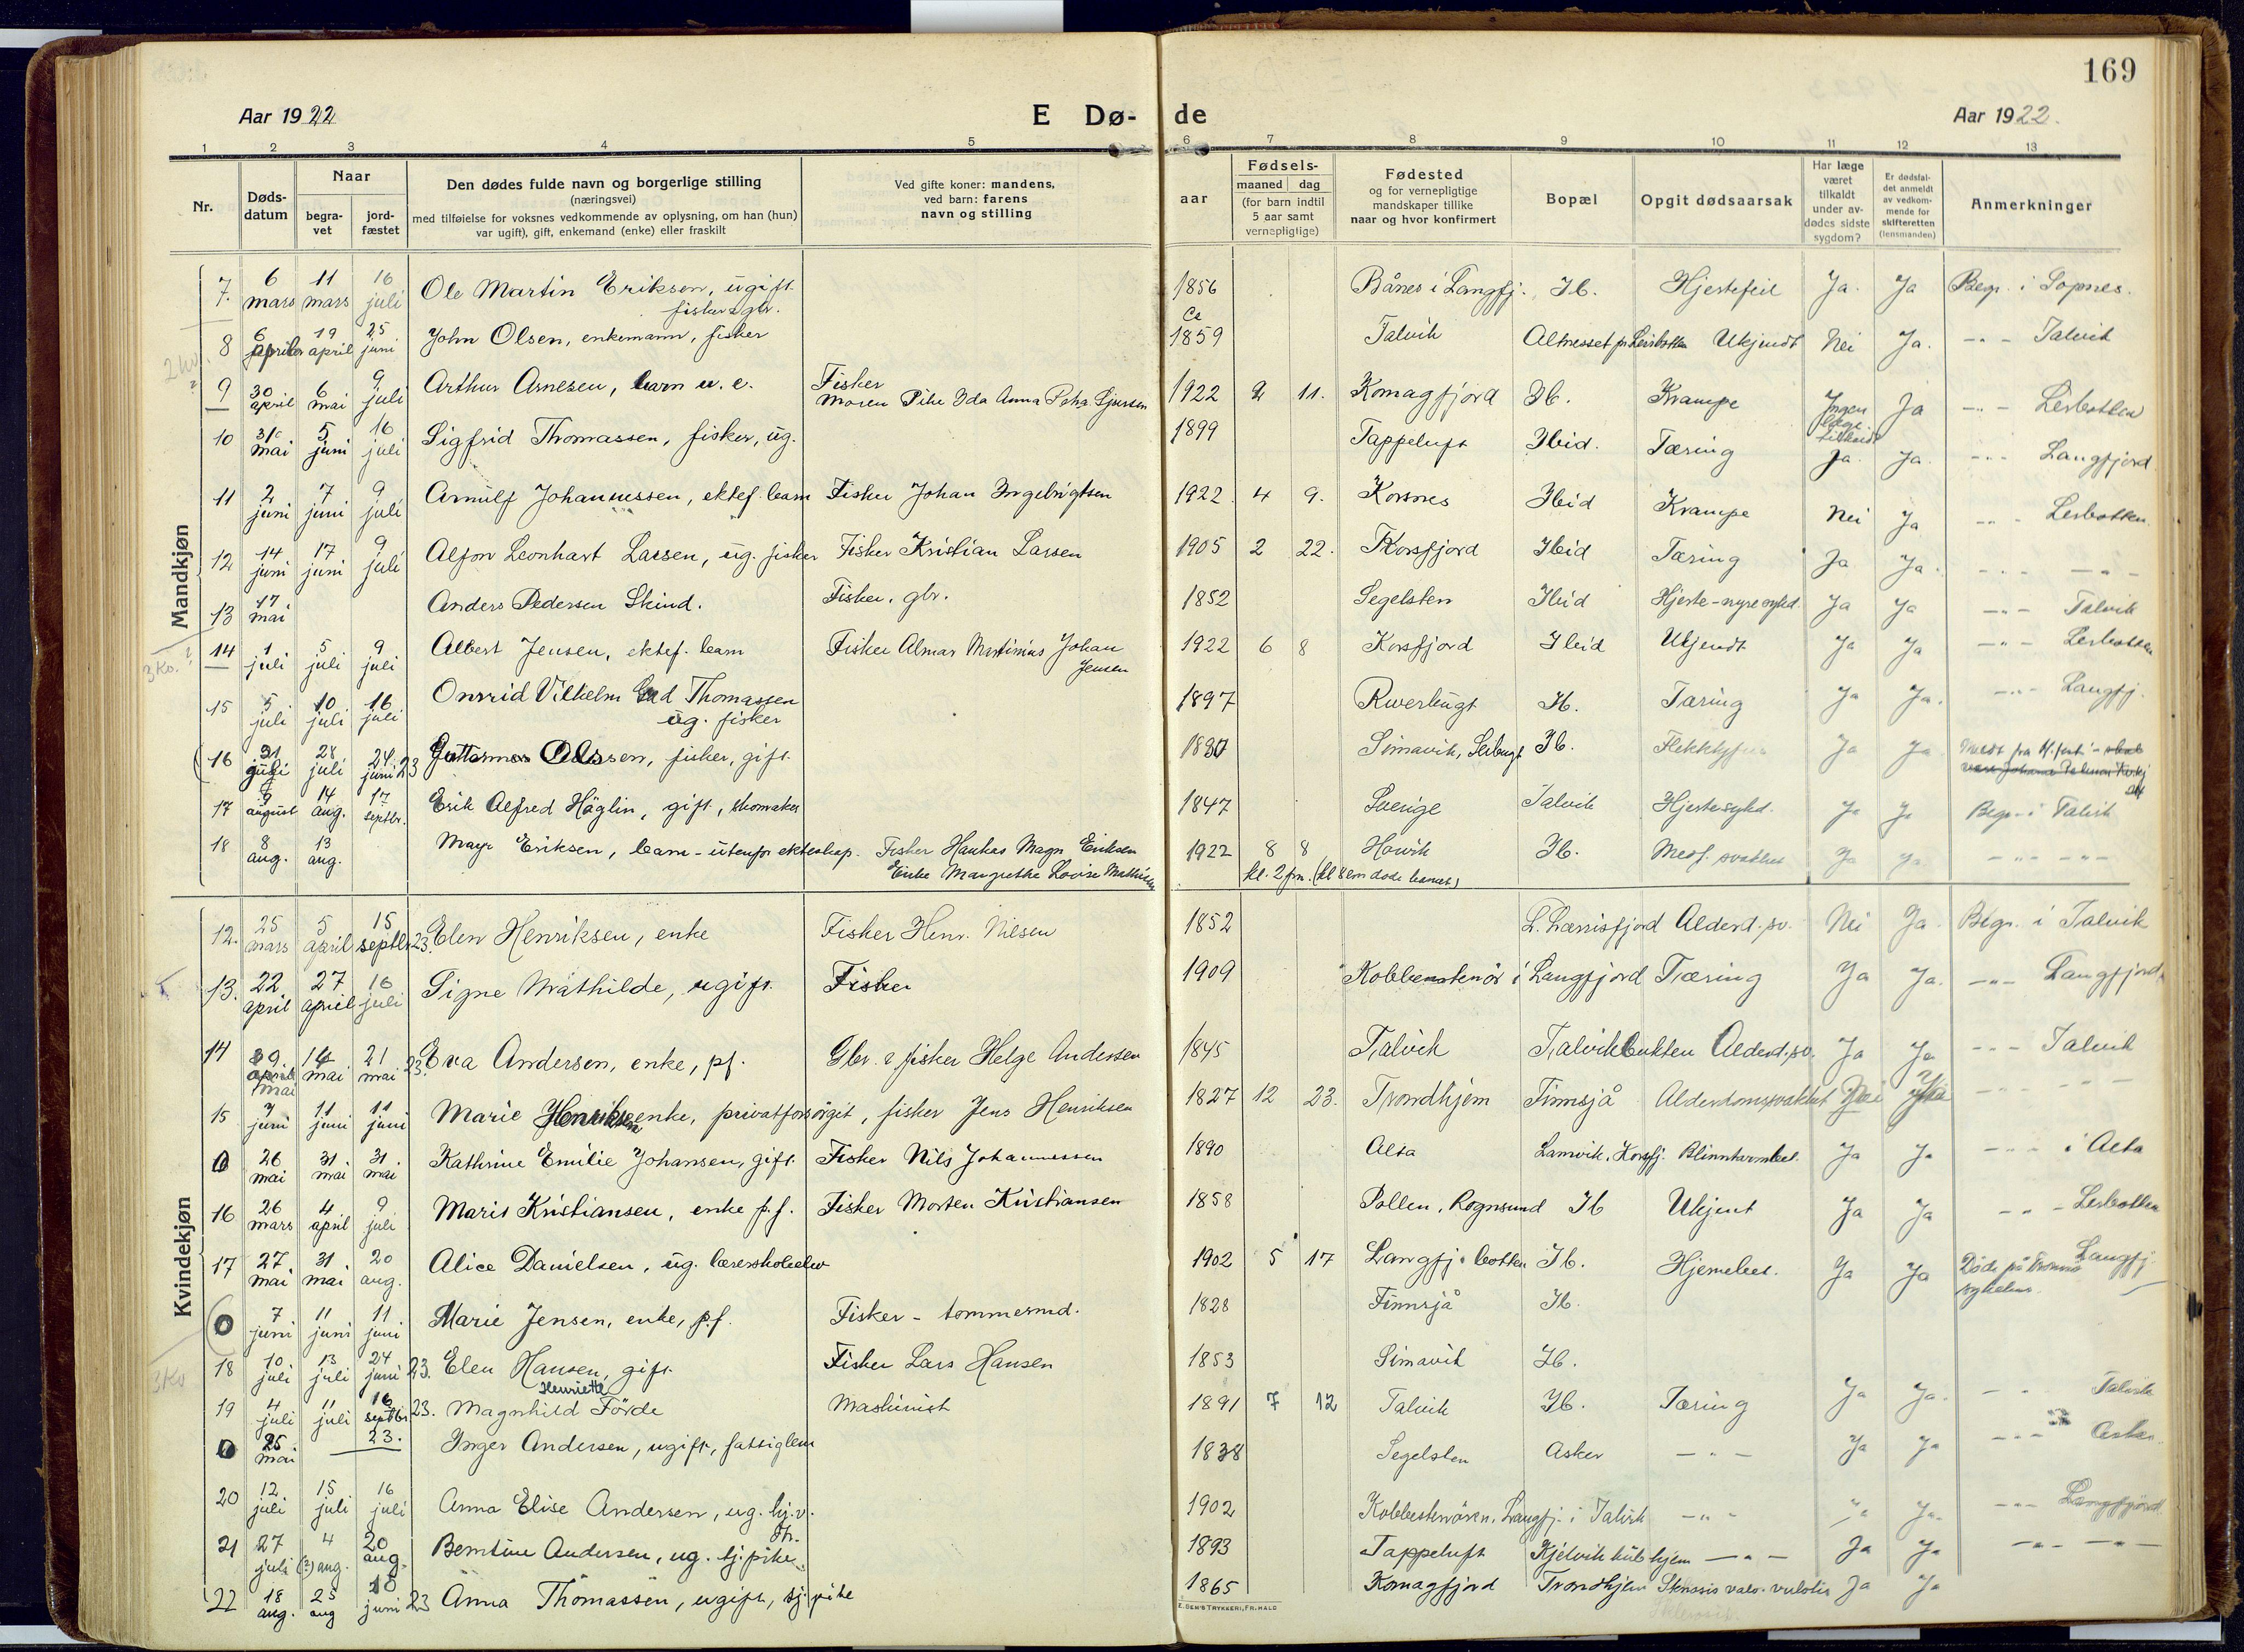 SATØ, Talvik sokneprestkontor, H/Ha/L0018kirke: Ministerialbok nr. 18, 1915-1924, s. 169